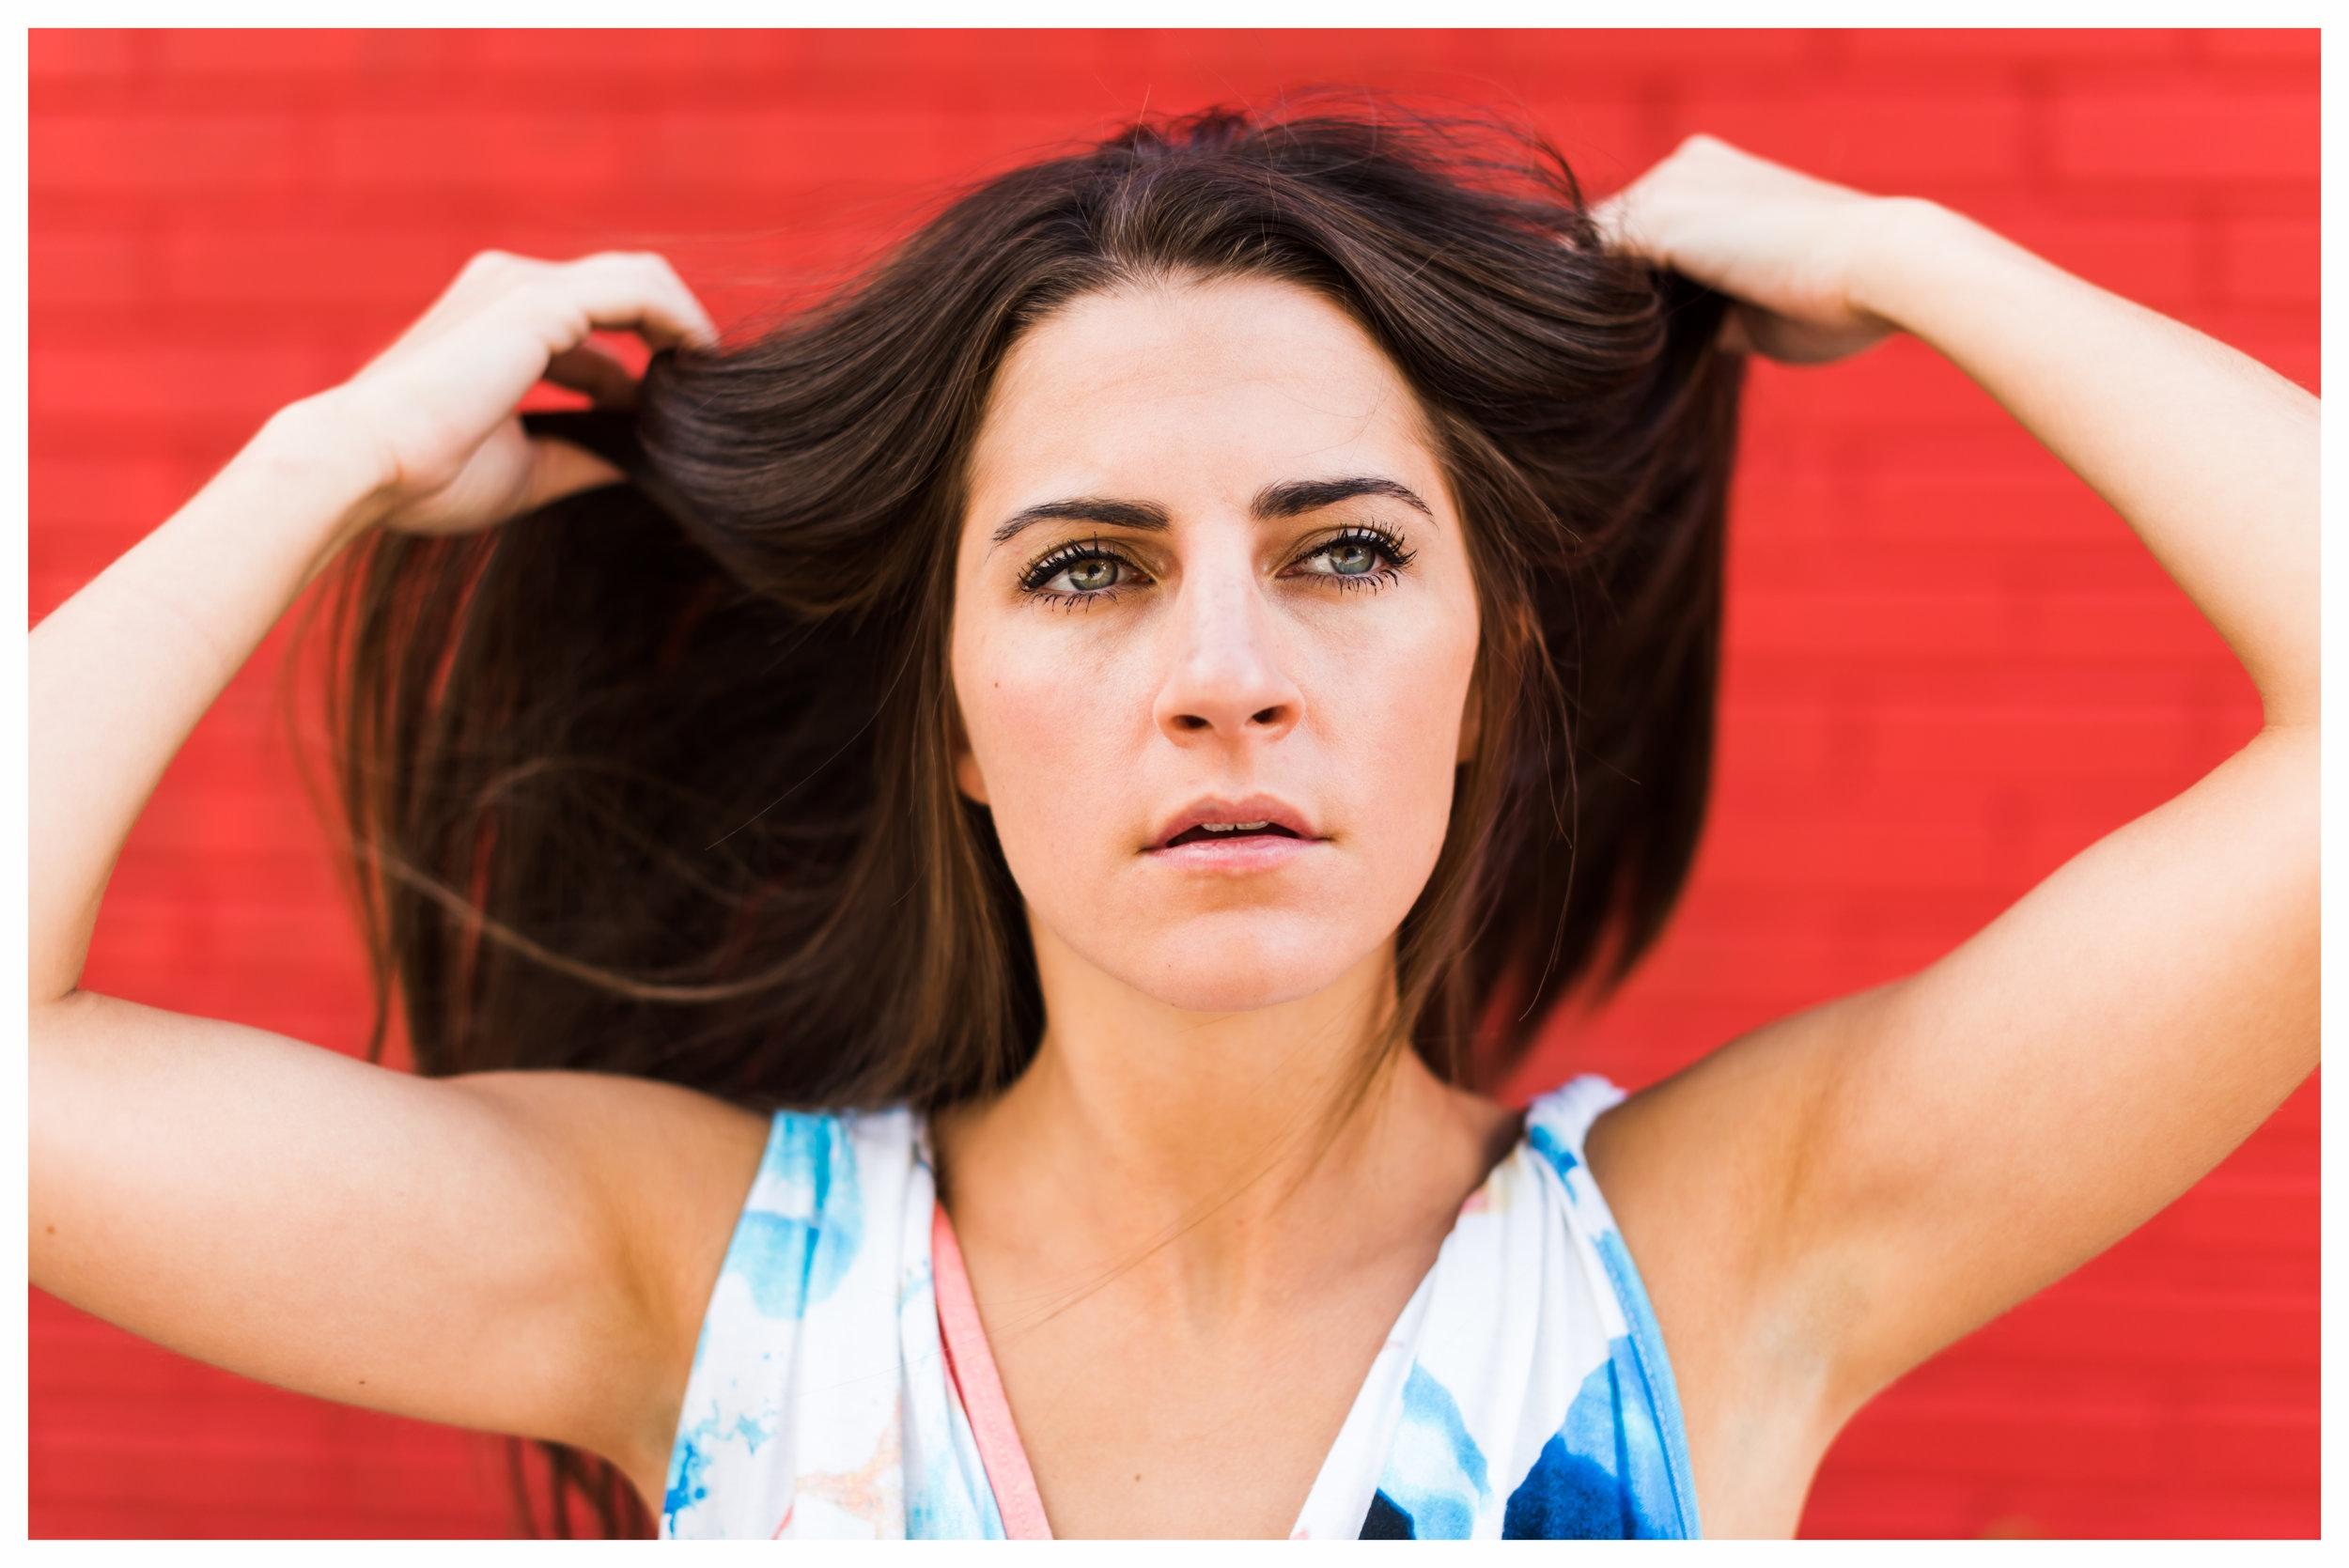 Lucy's Photoshoot-14.jpg